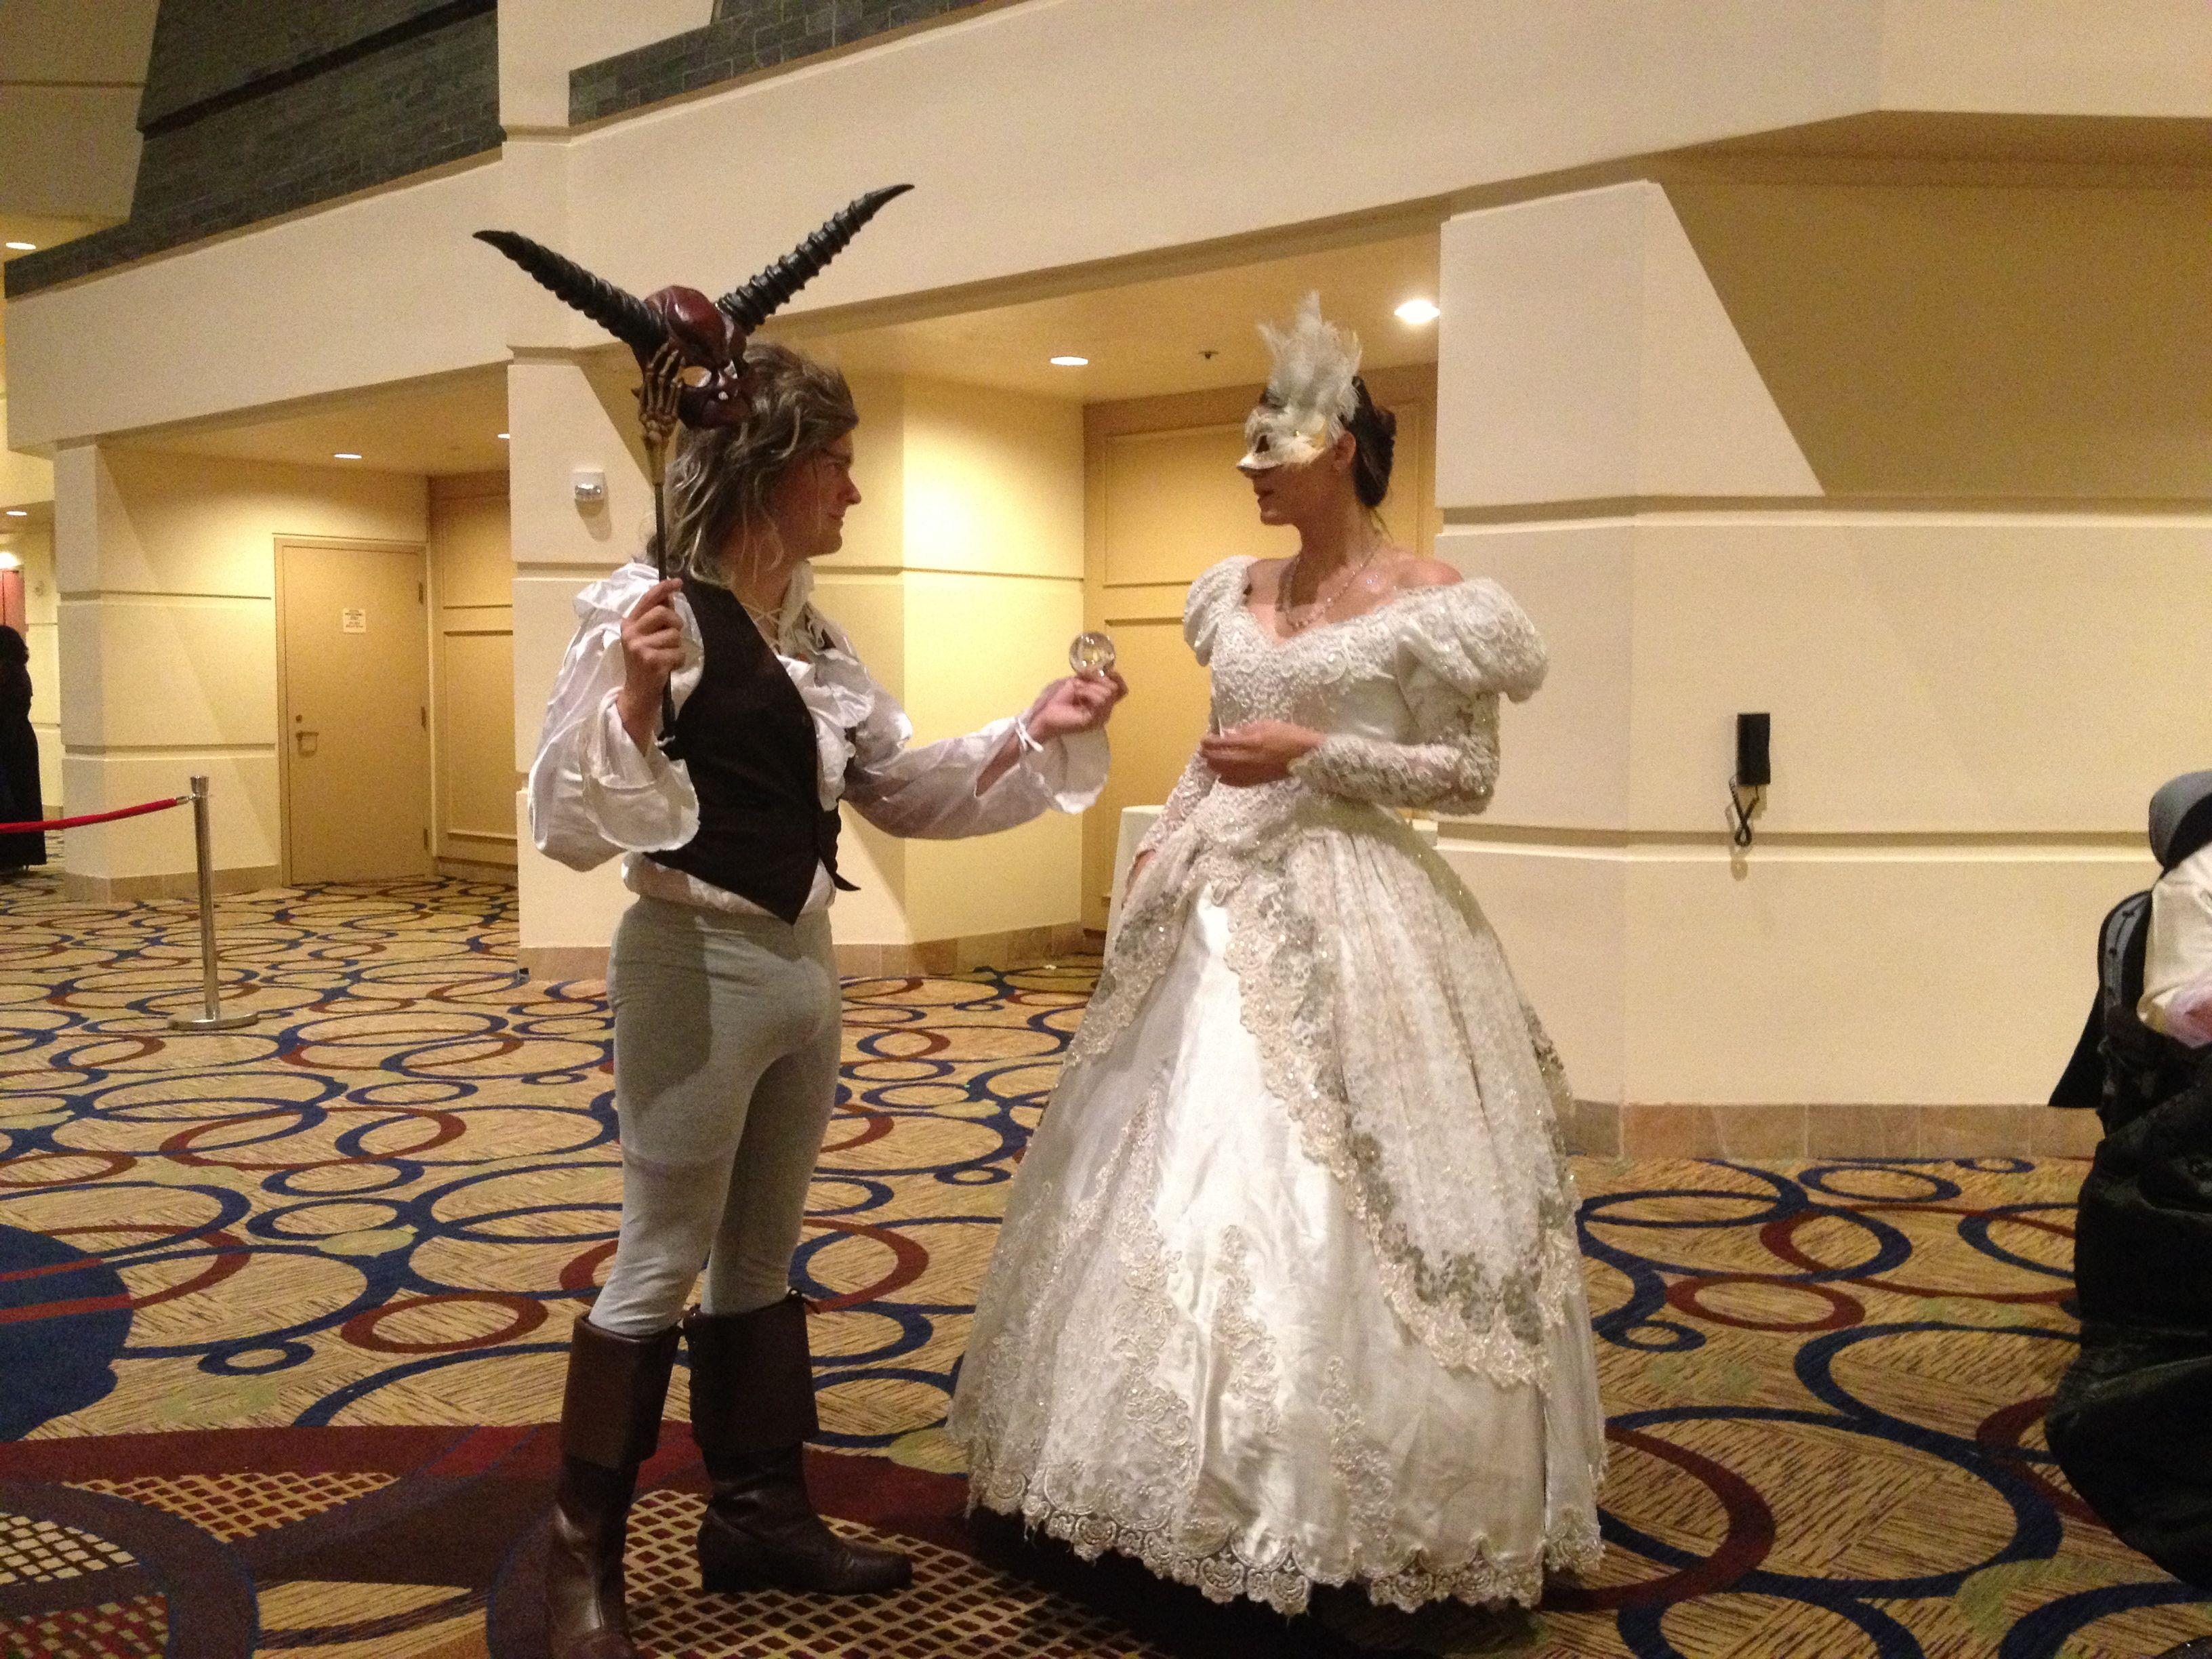 Two attendees dressed in full ball regalia for Goblin Ball